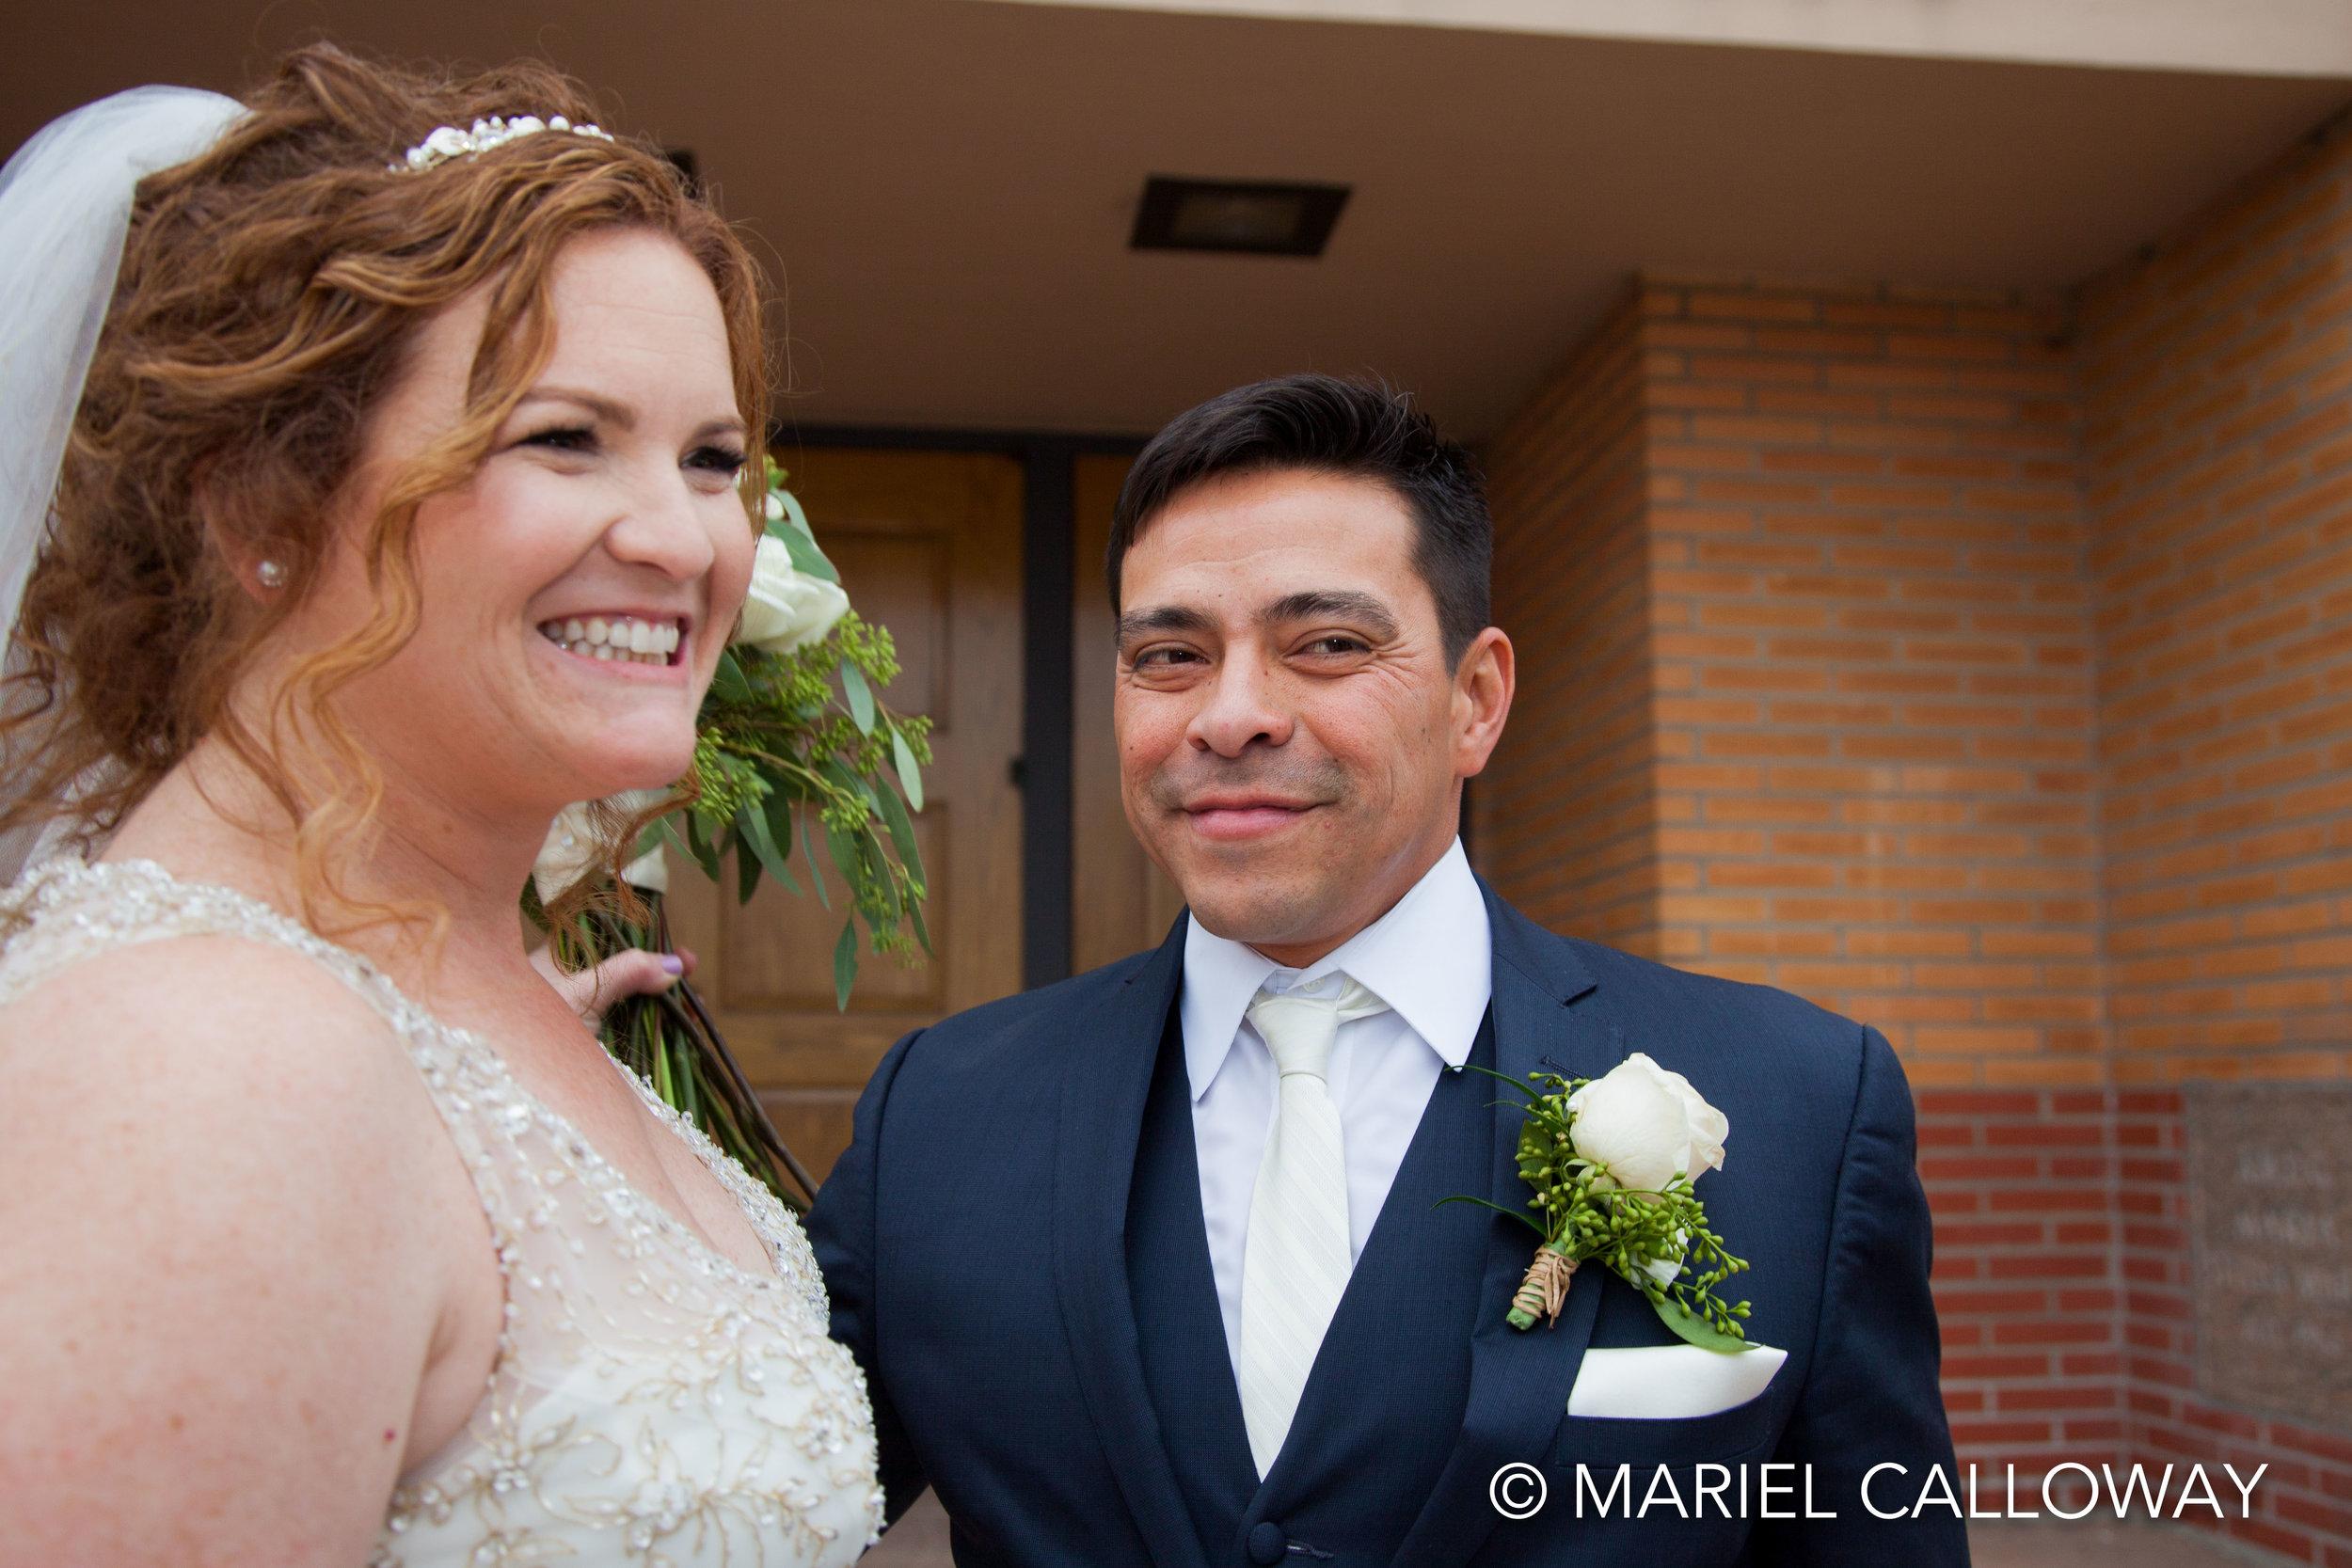 Mariel-Calloway-Los-Angeles-Wedding-Photography-Carmona-22.jpg